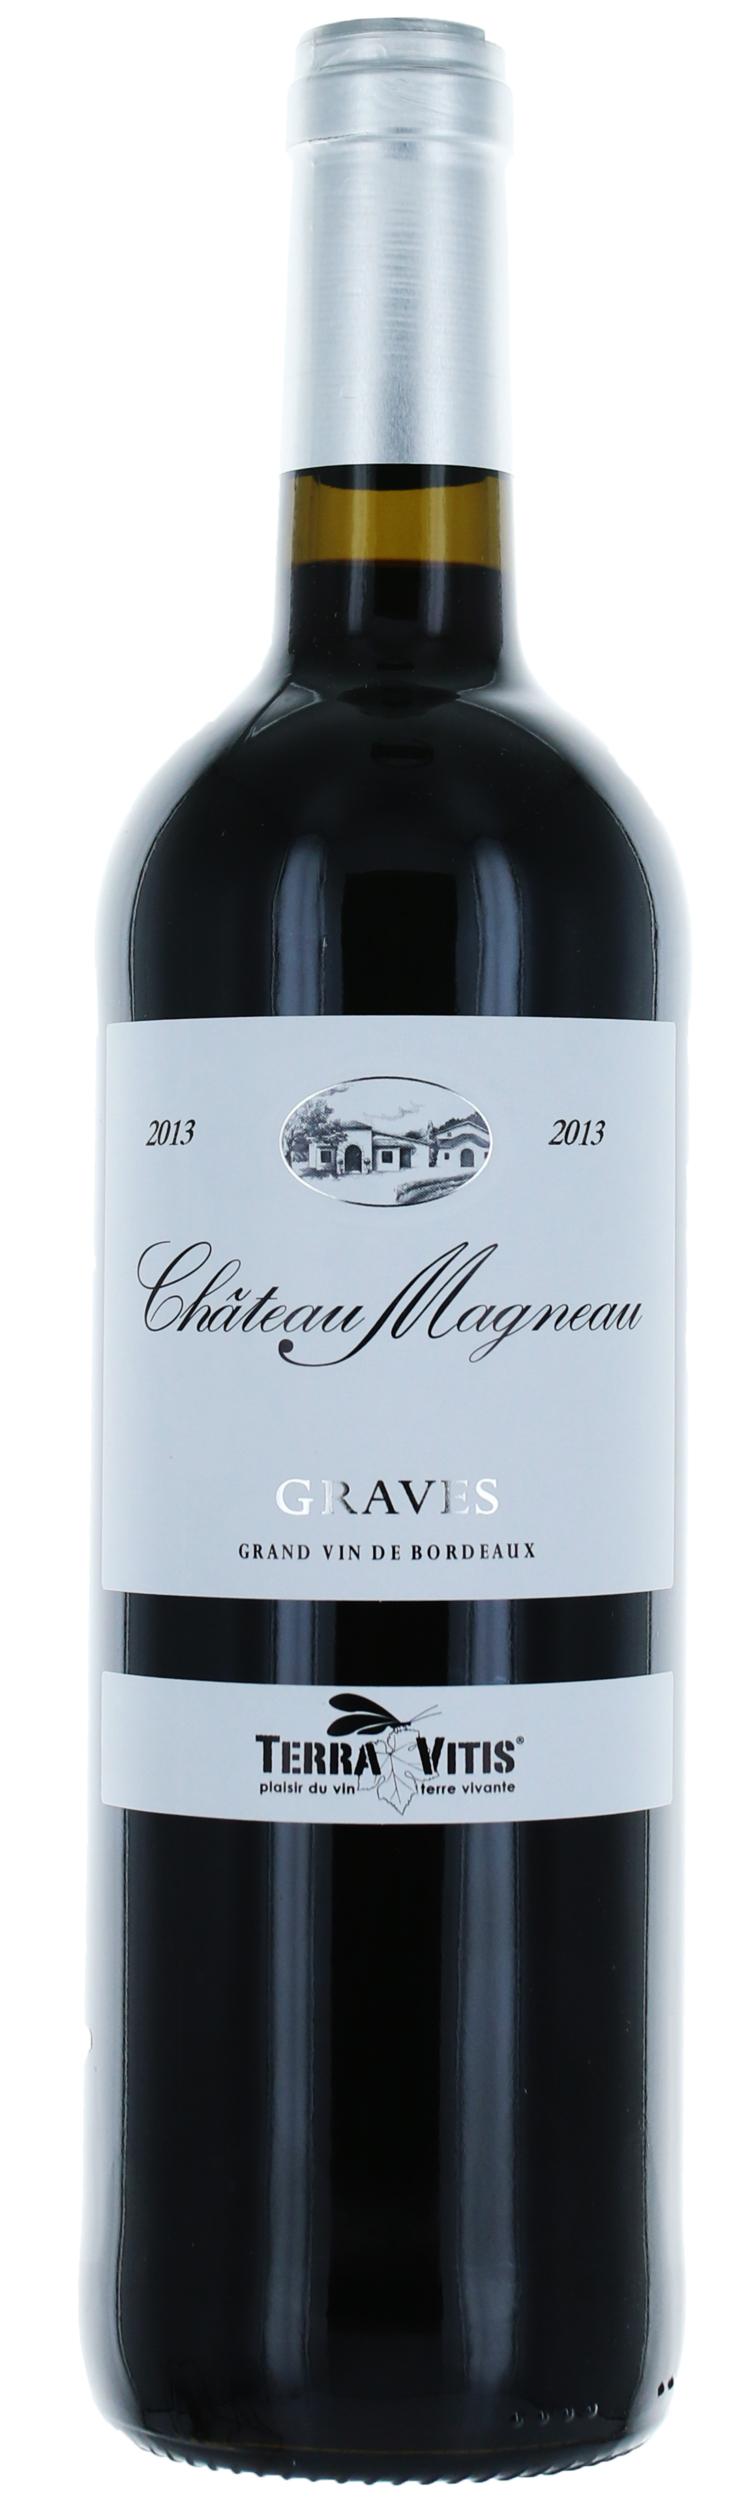 Graves - Grand Vin - Château Magneau - 2015